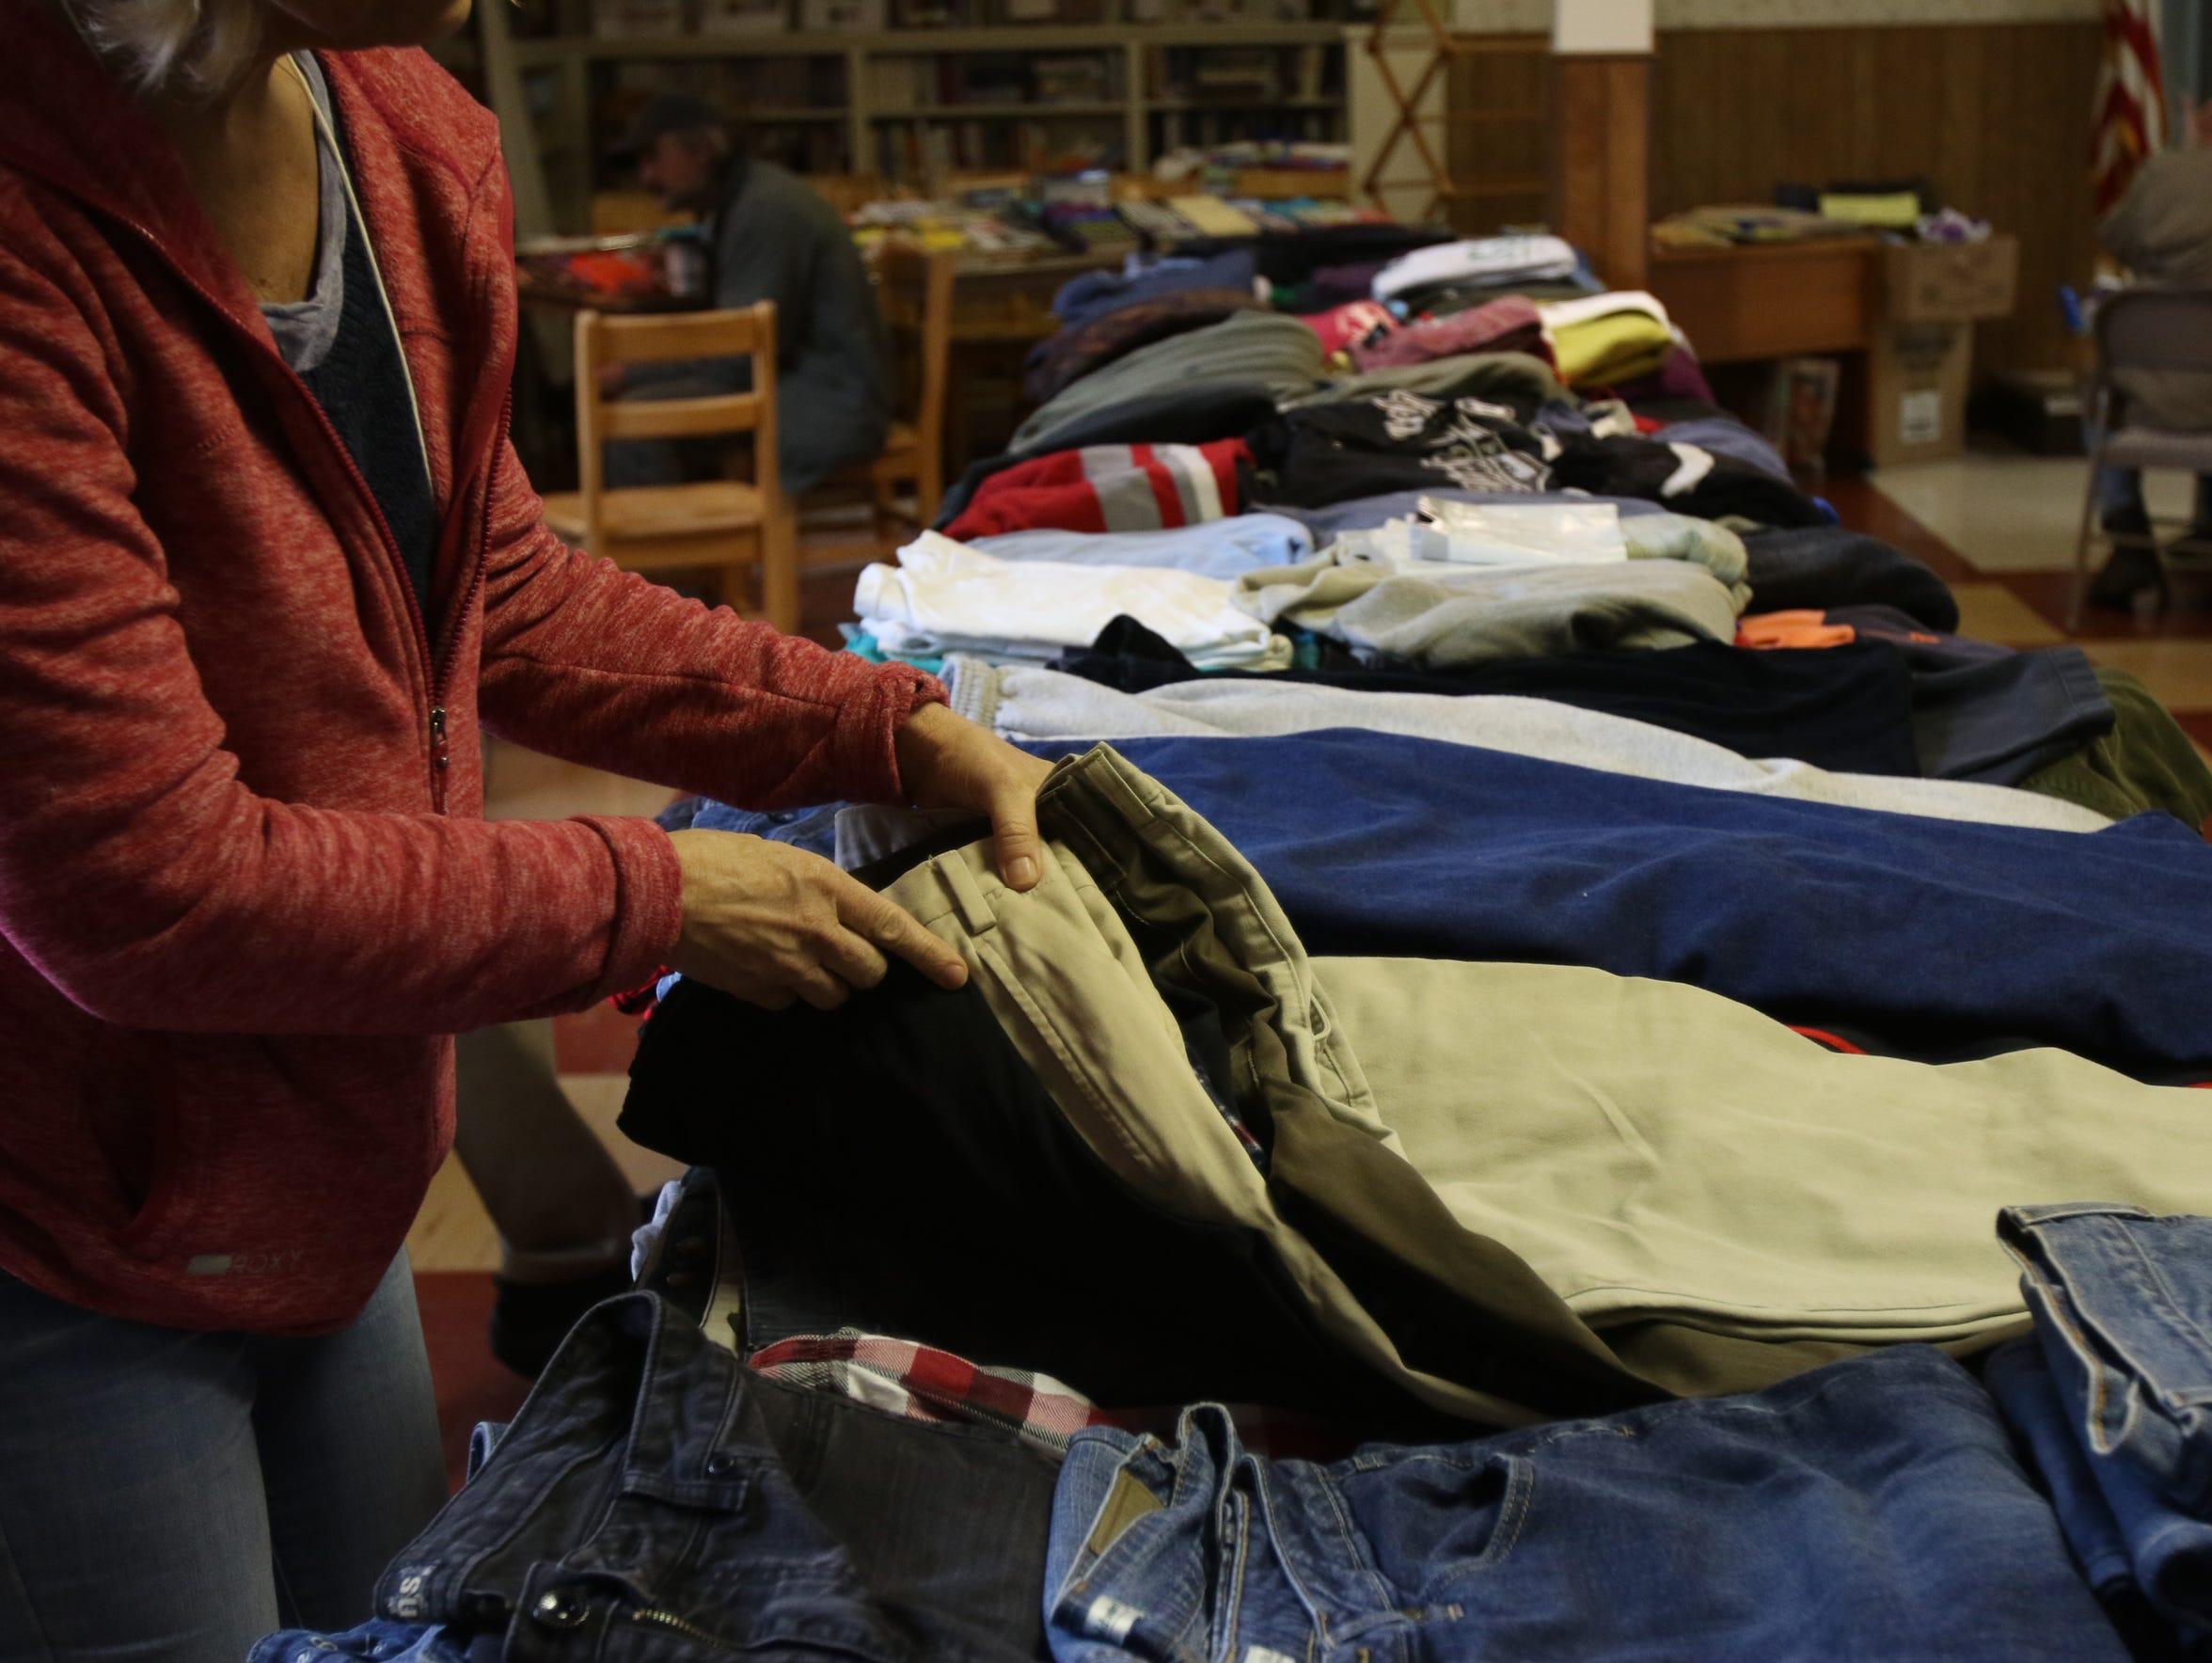 A volunteer sorts clothing at Trinity Lutheran Church